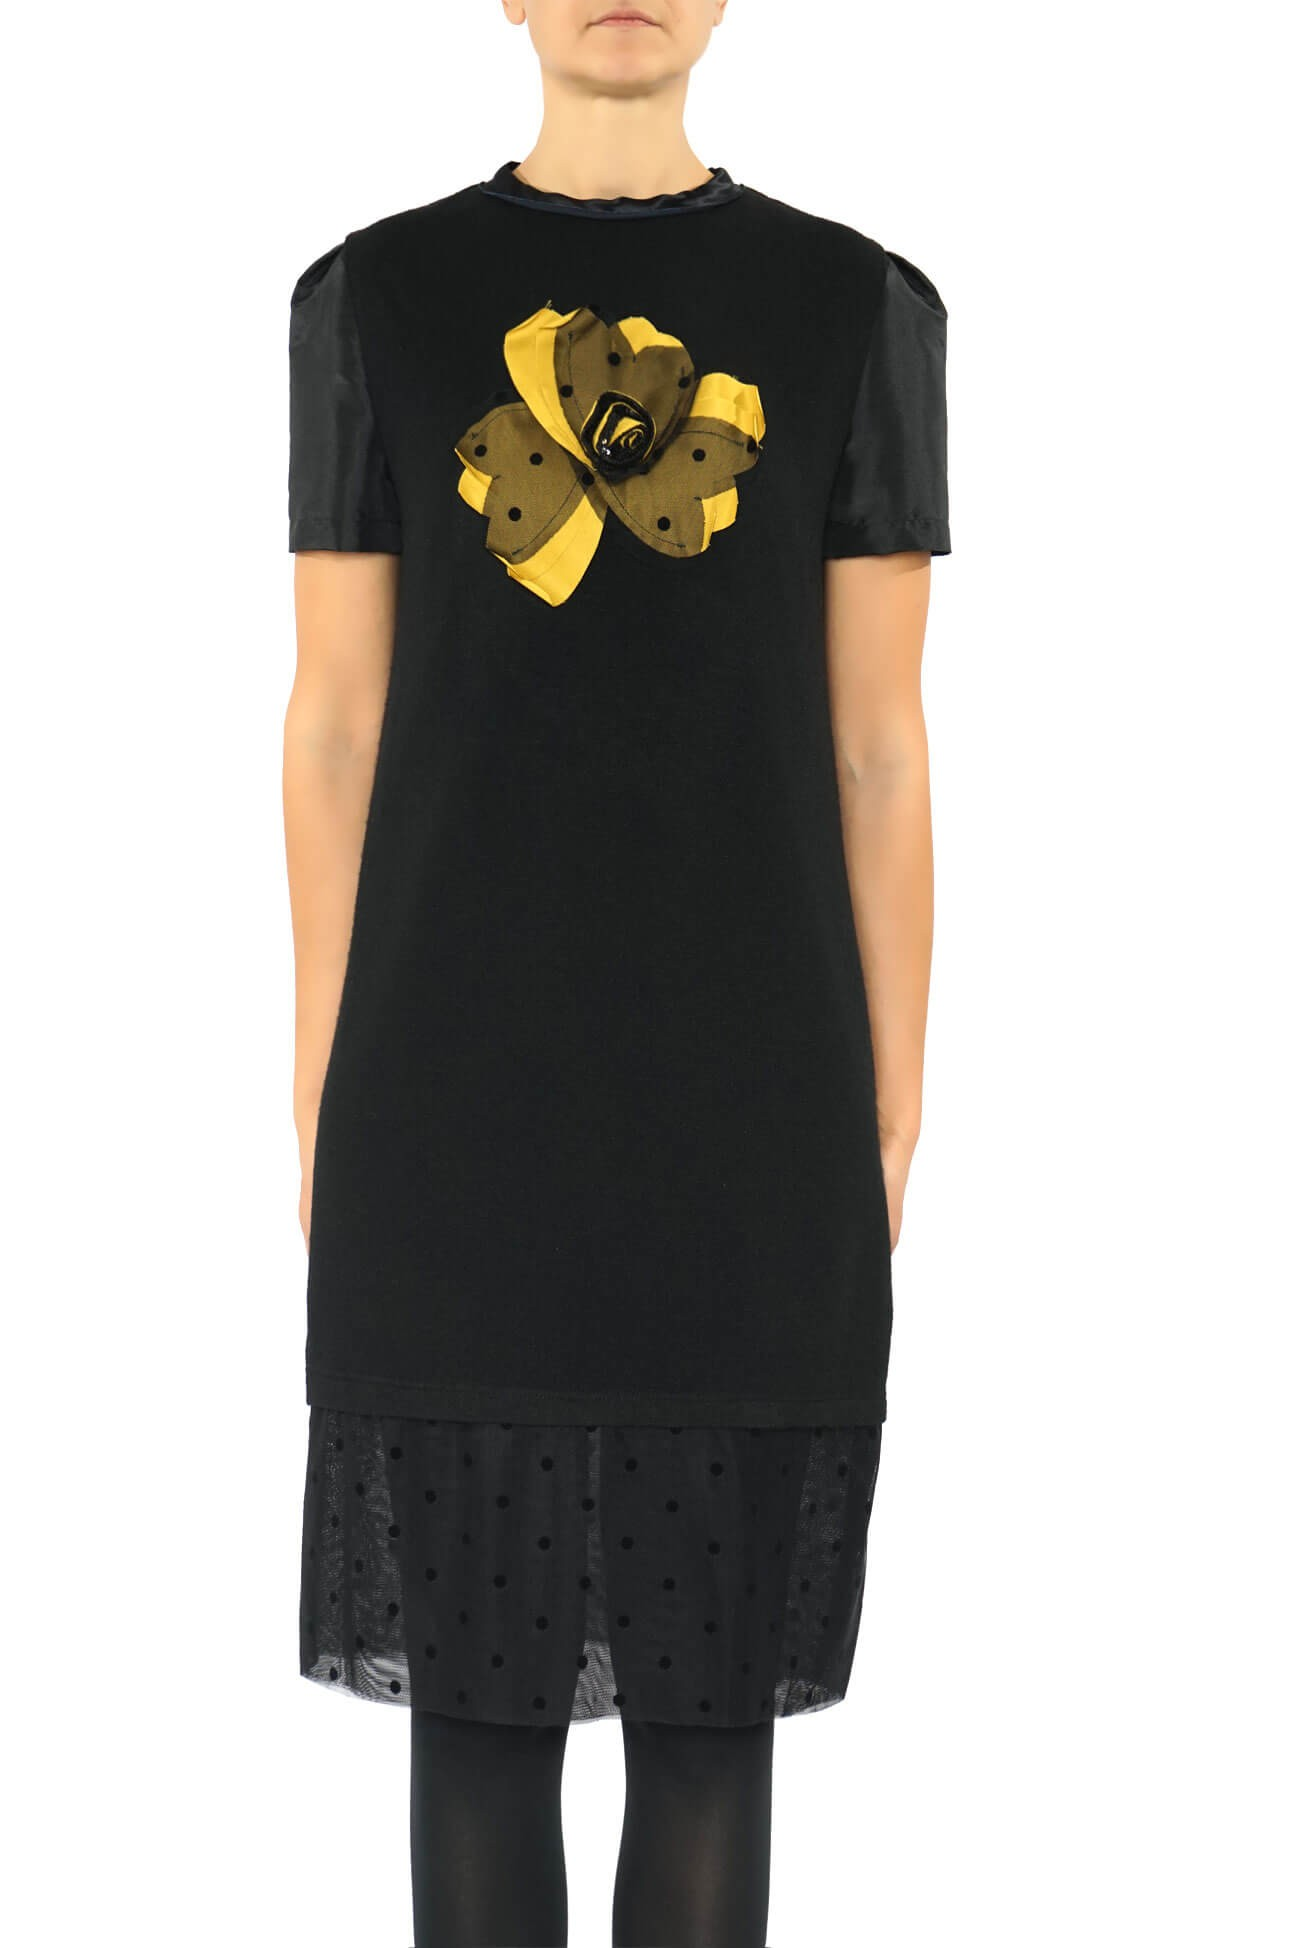 rochie din tricot de lana cu floare aplicata